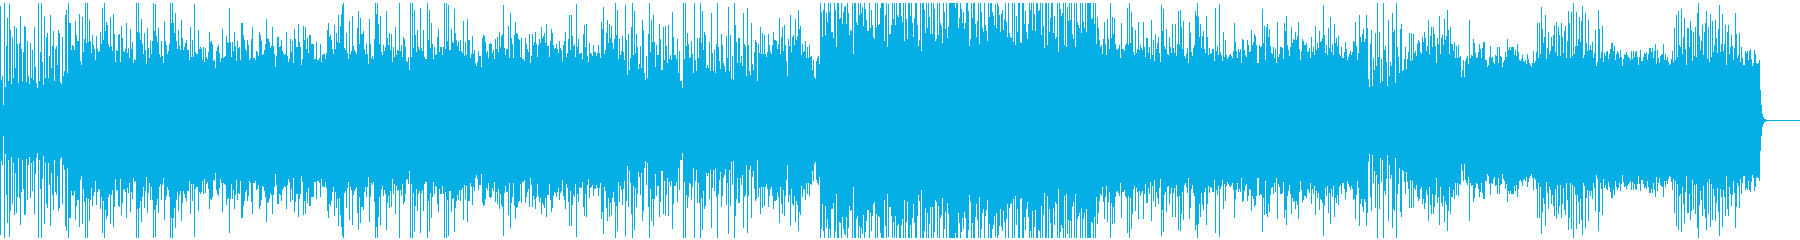 DnBビートで突き進むロックなバトル曲の再生済みの波形